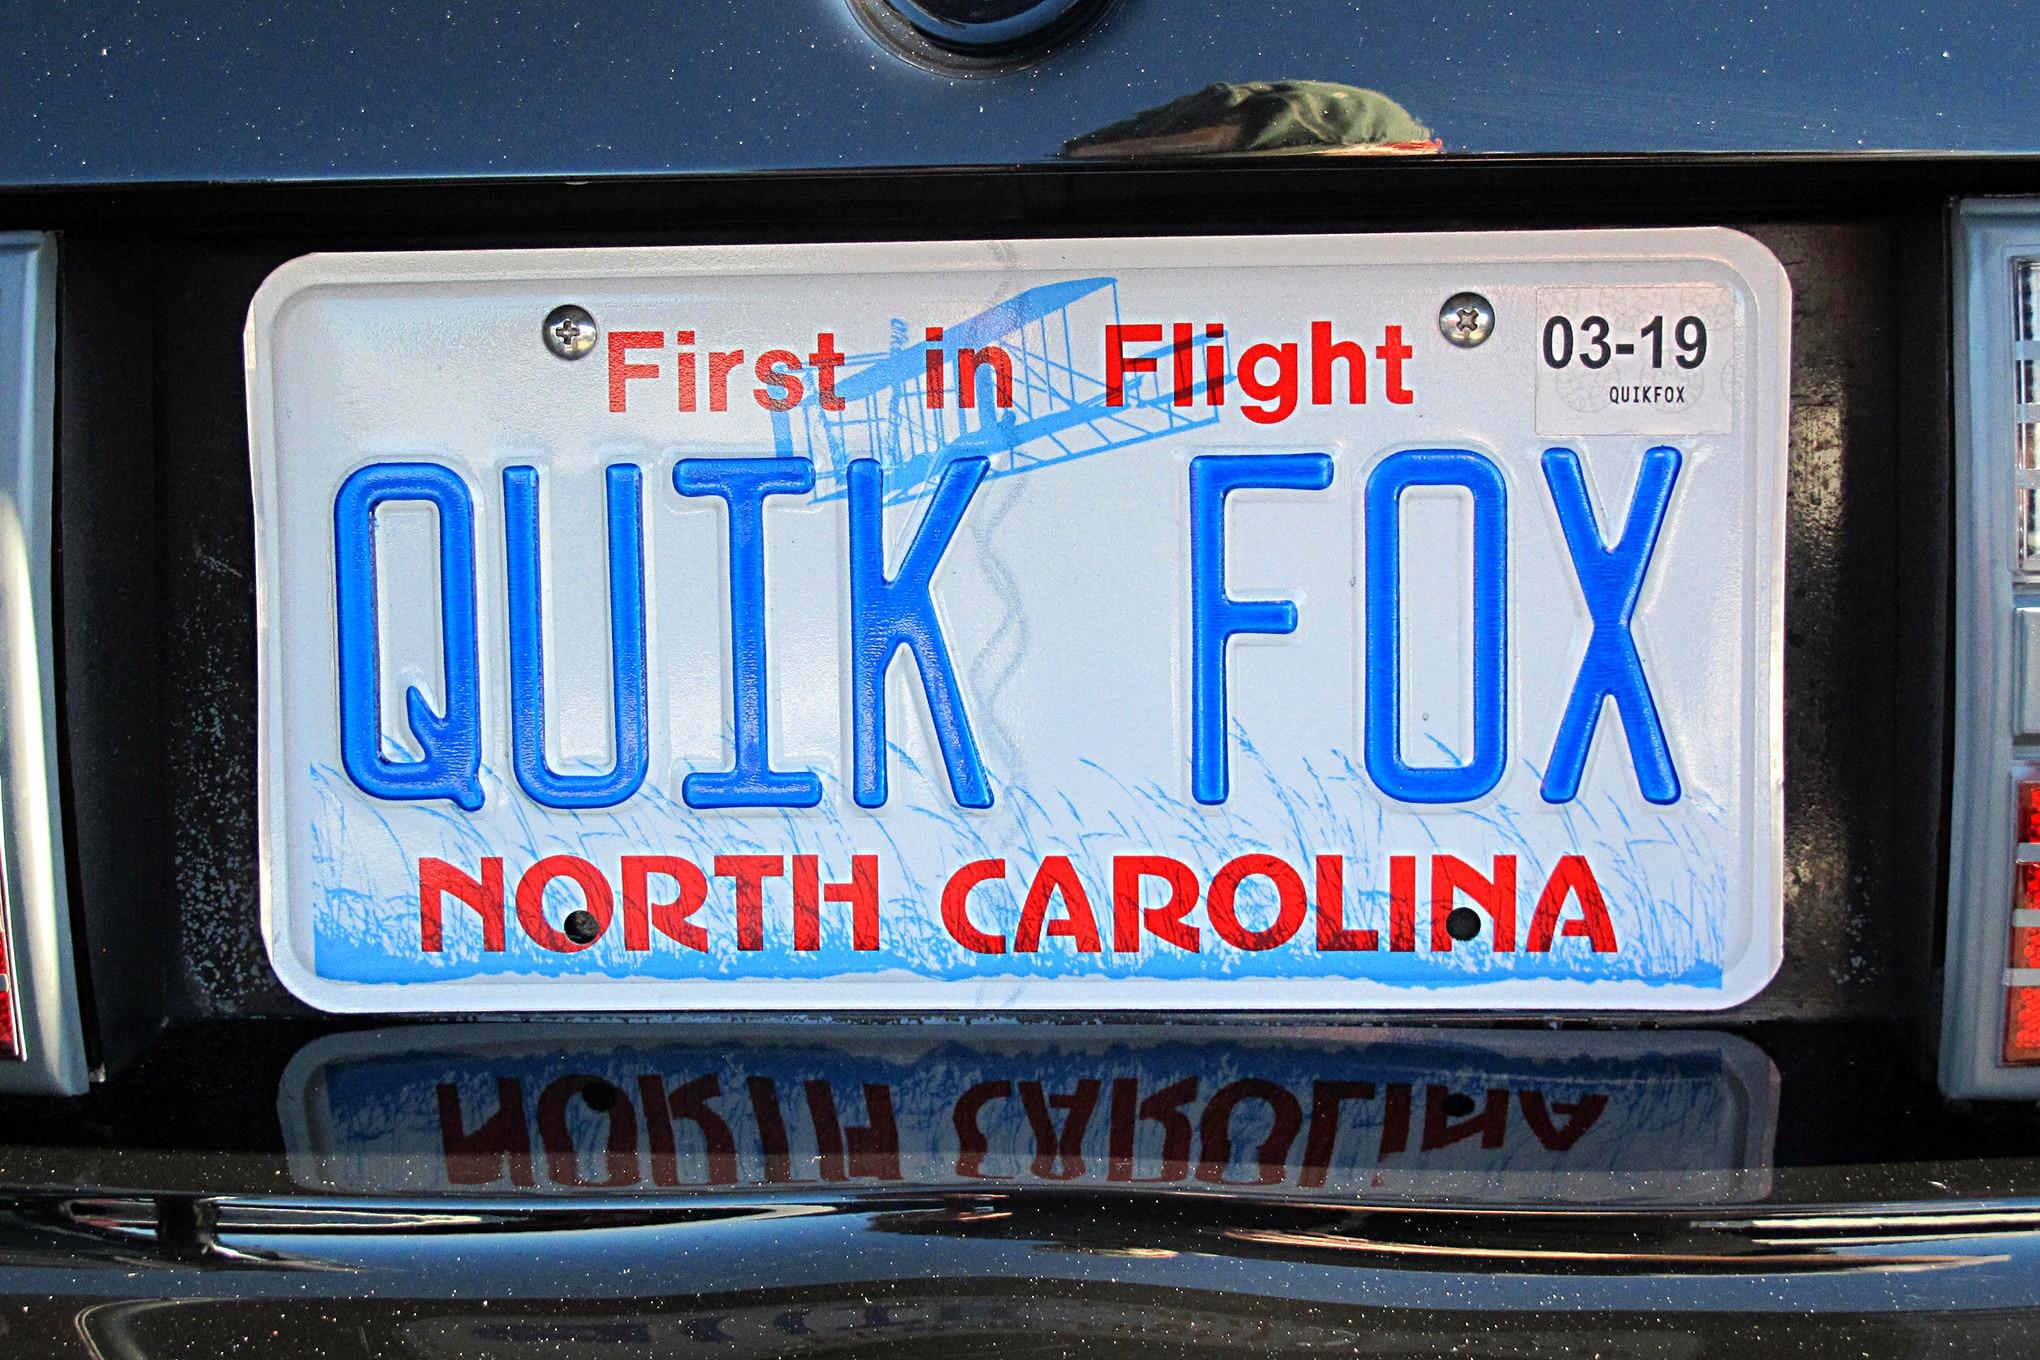 Foxtoberfest Fox Mustang Vanity Plate 24